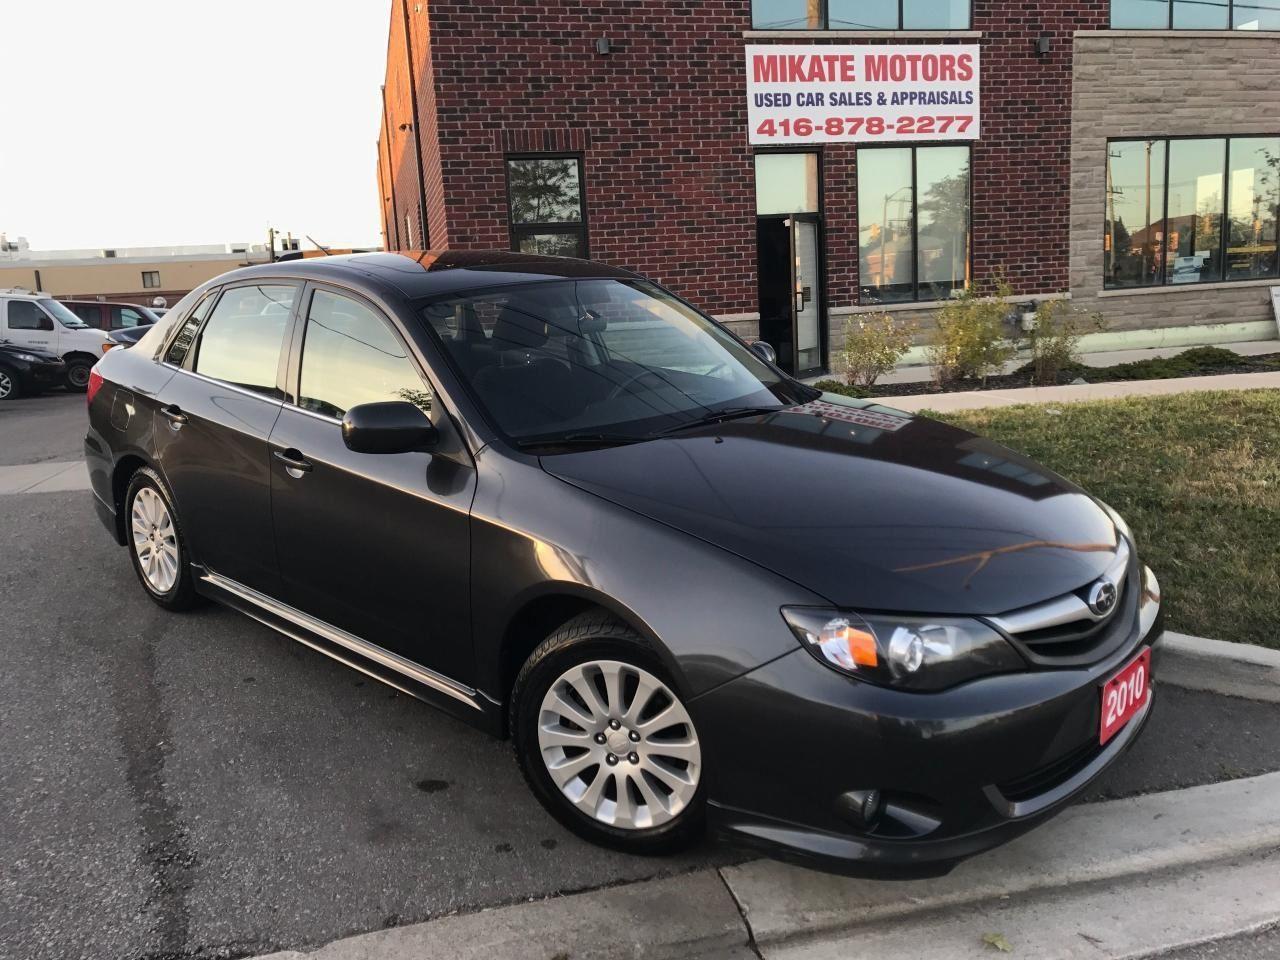 Photo of Gray 2010 Subaru Impreza